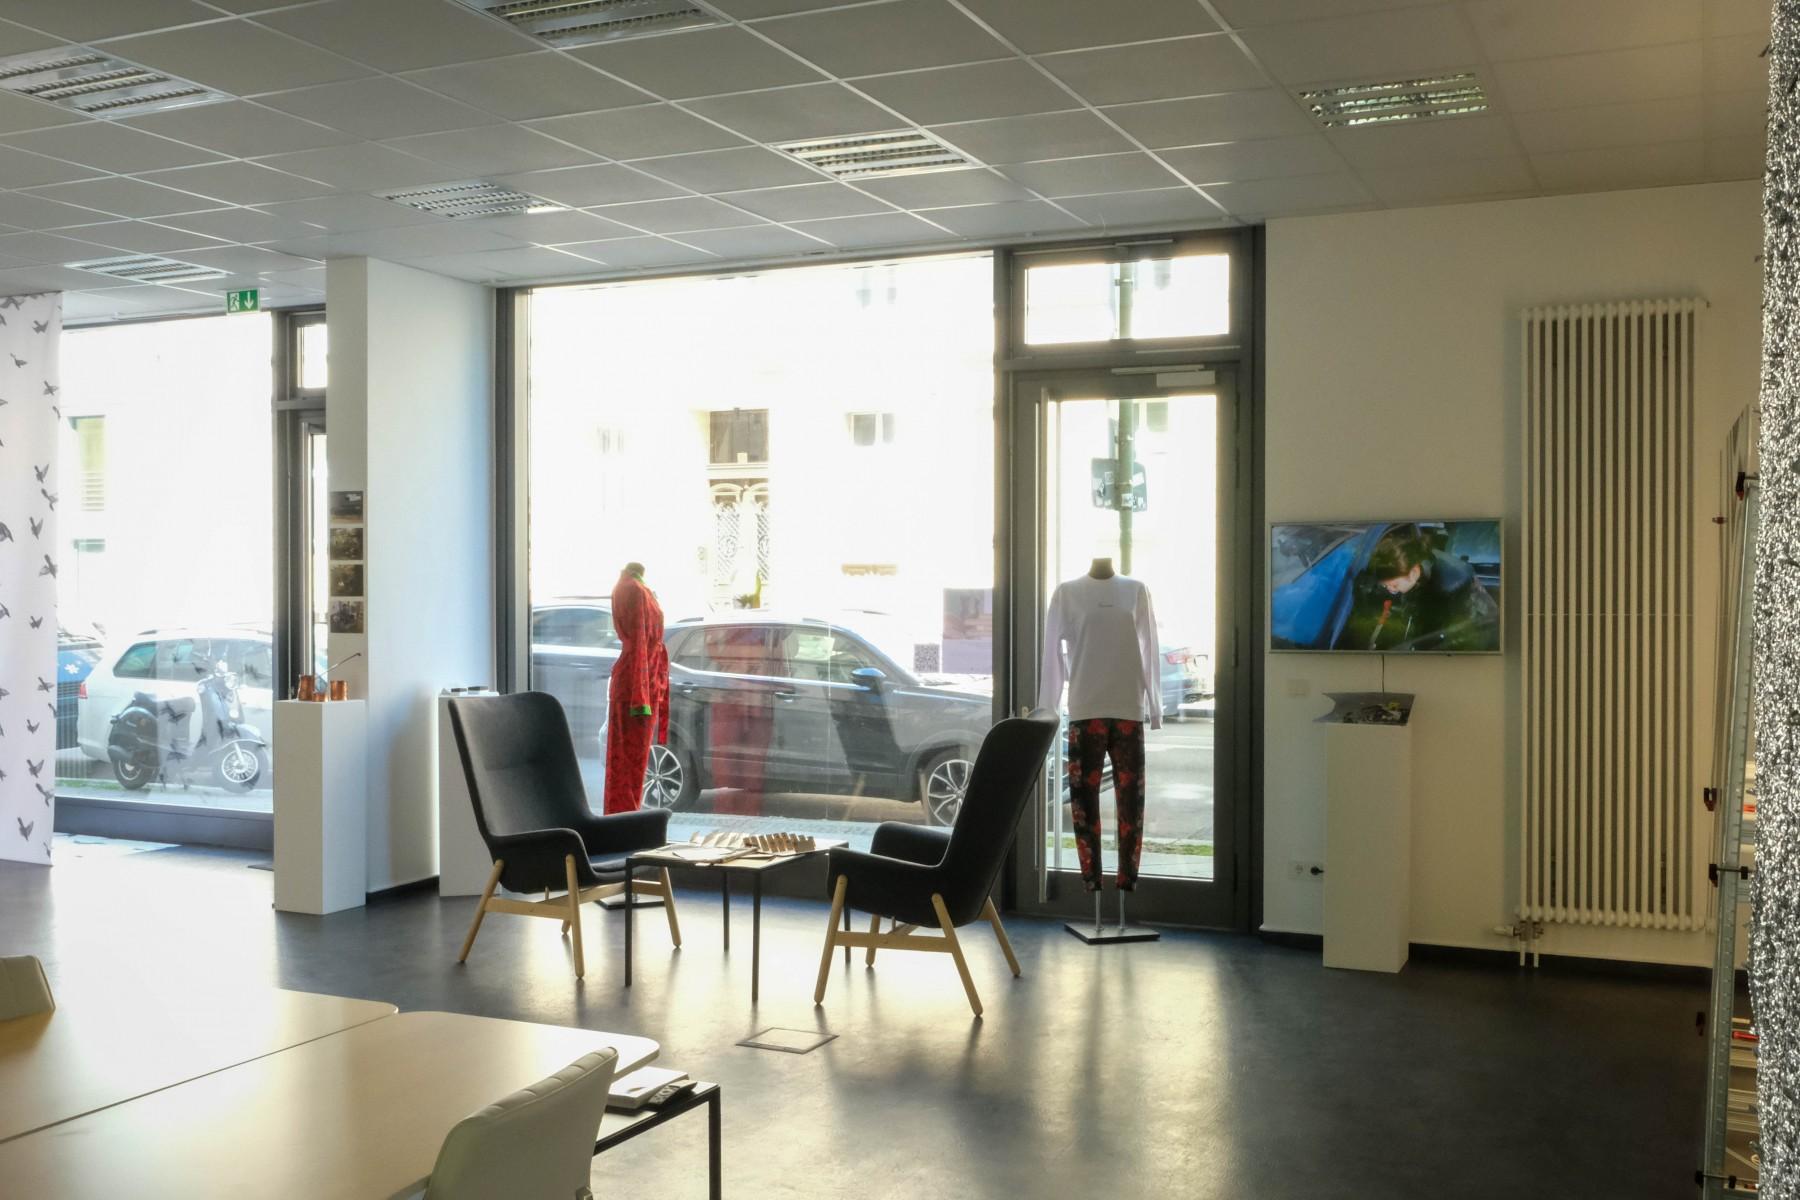 ERIAC Art Space